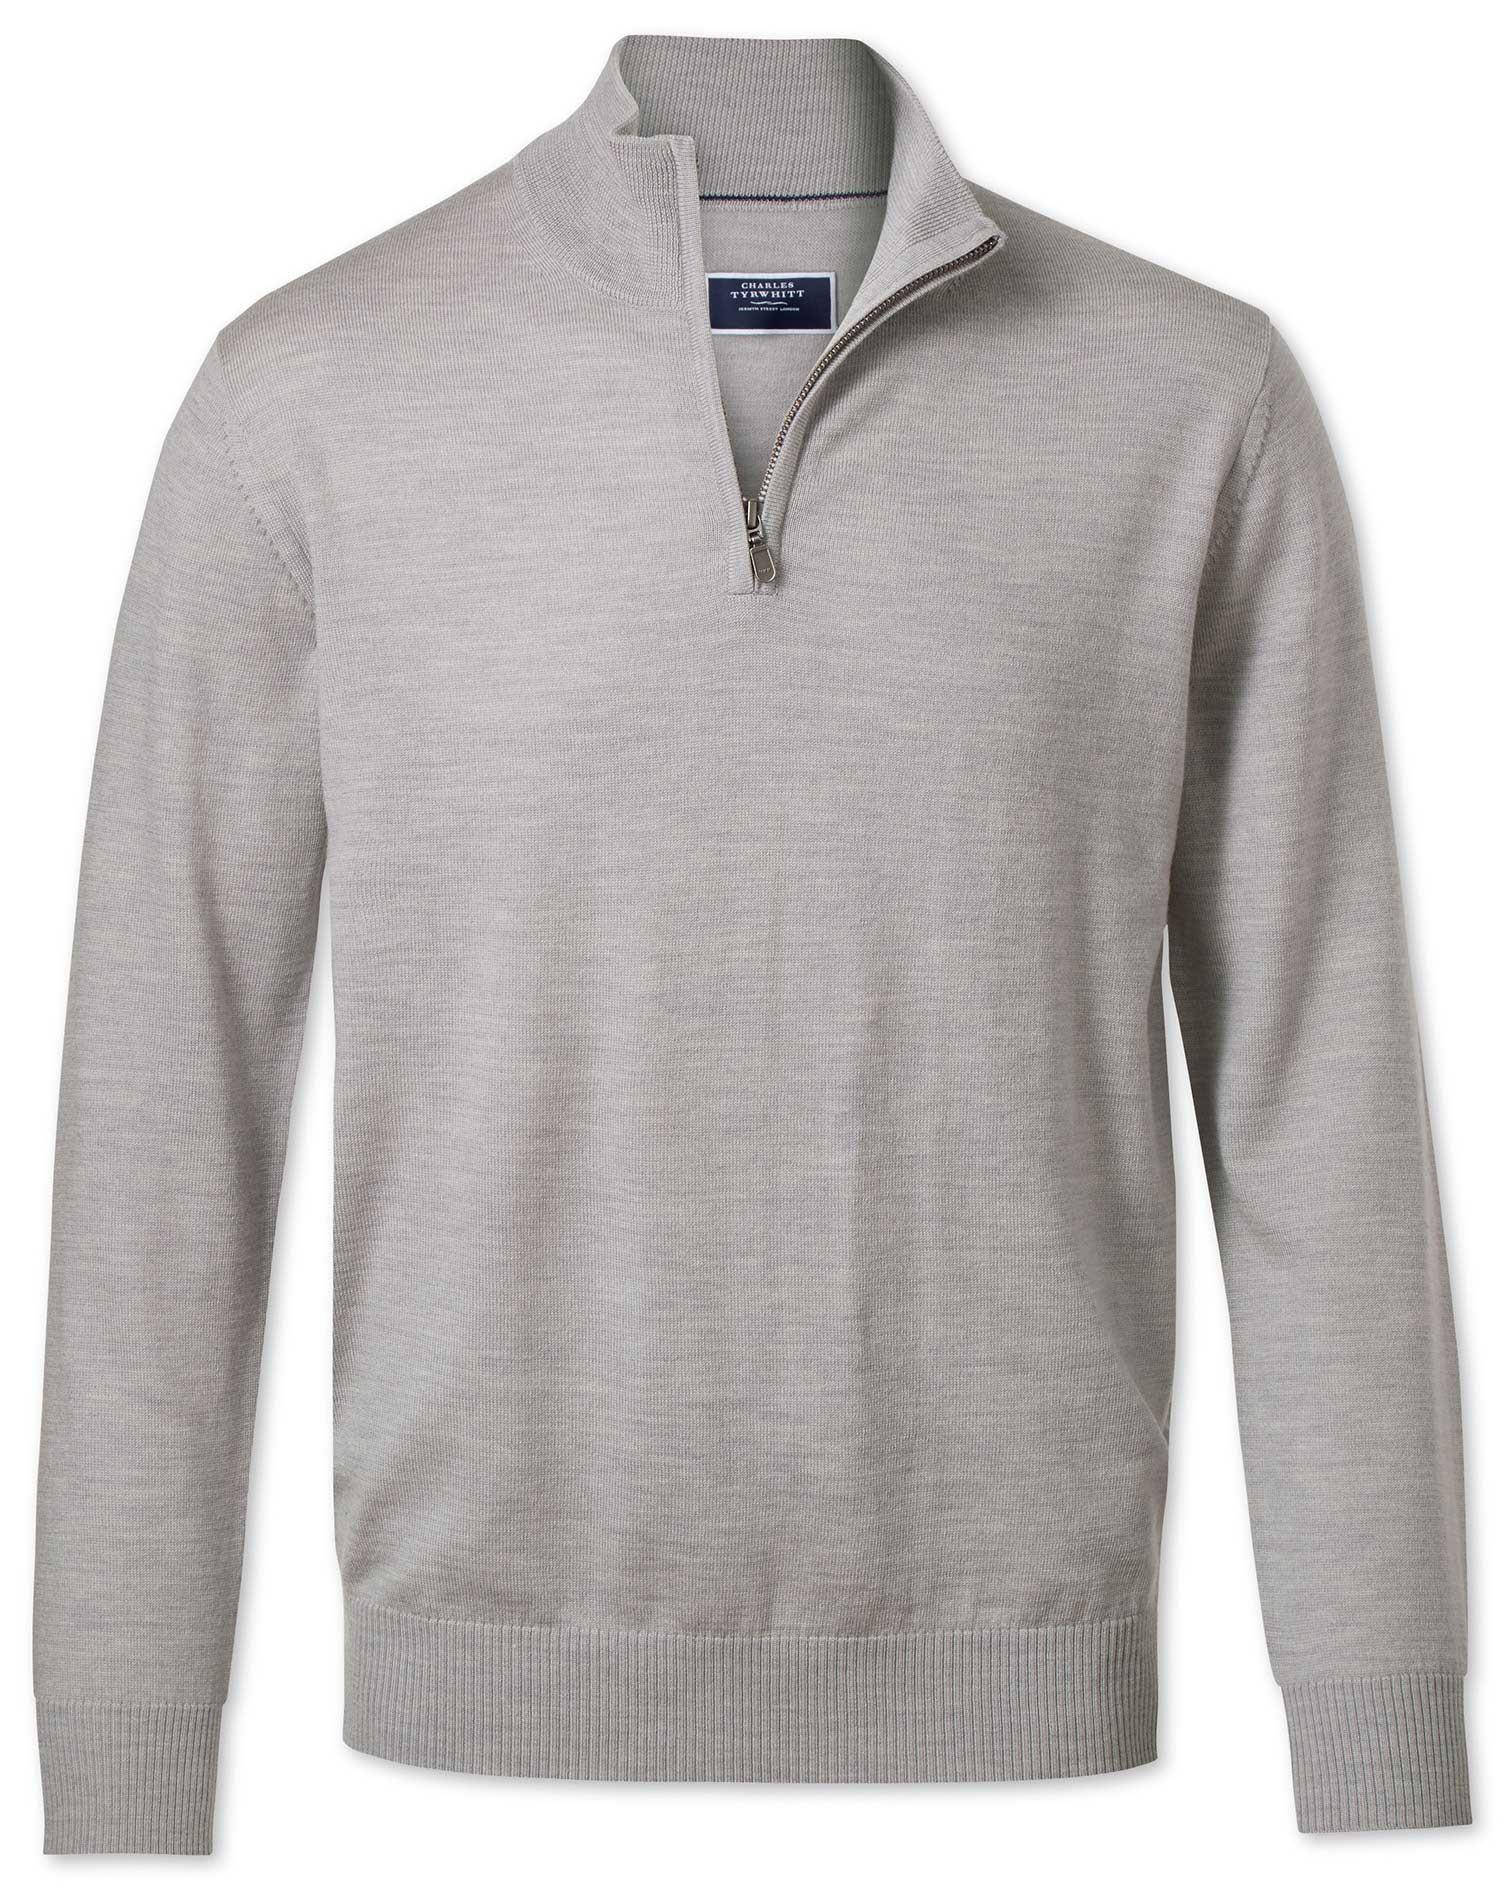 Silver Zip Neck Merino Wool Jumper Size XL by Charles Tyrwhitt